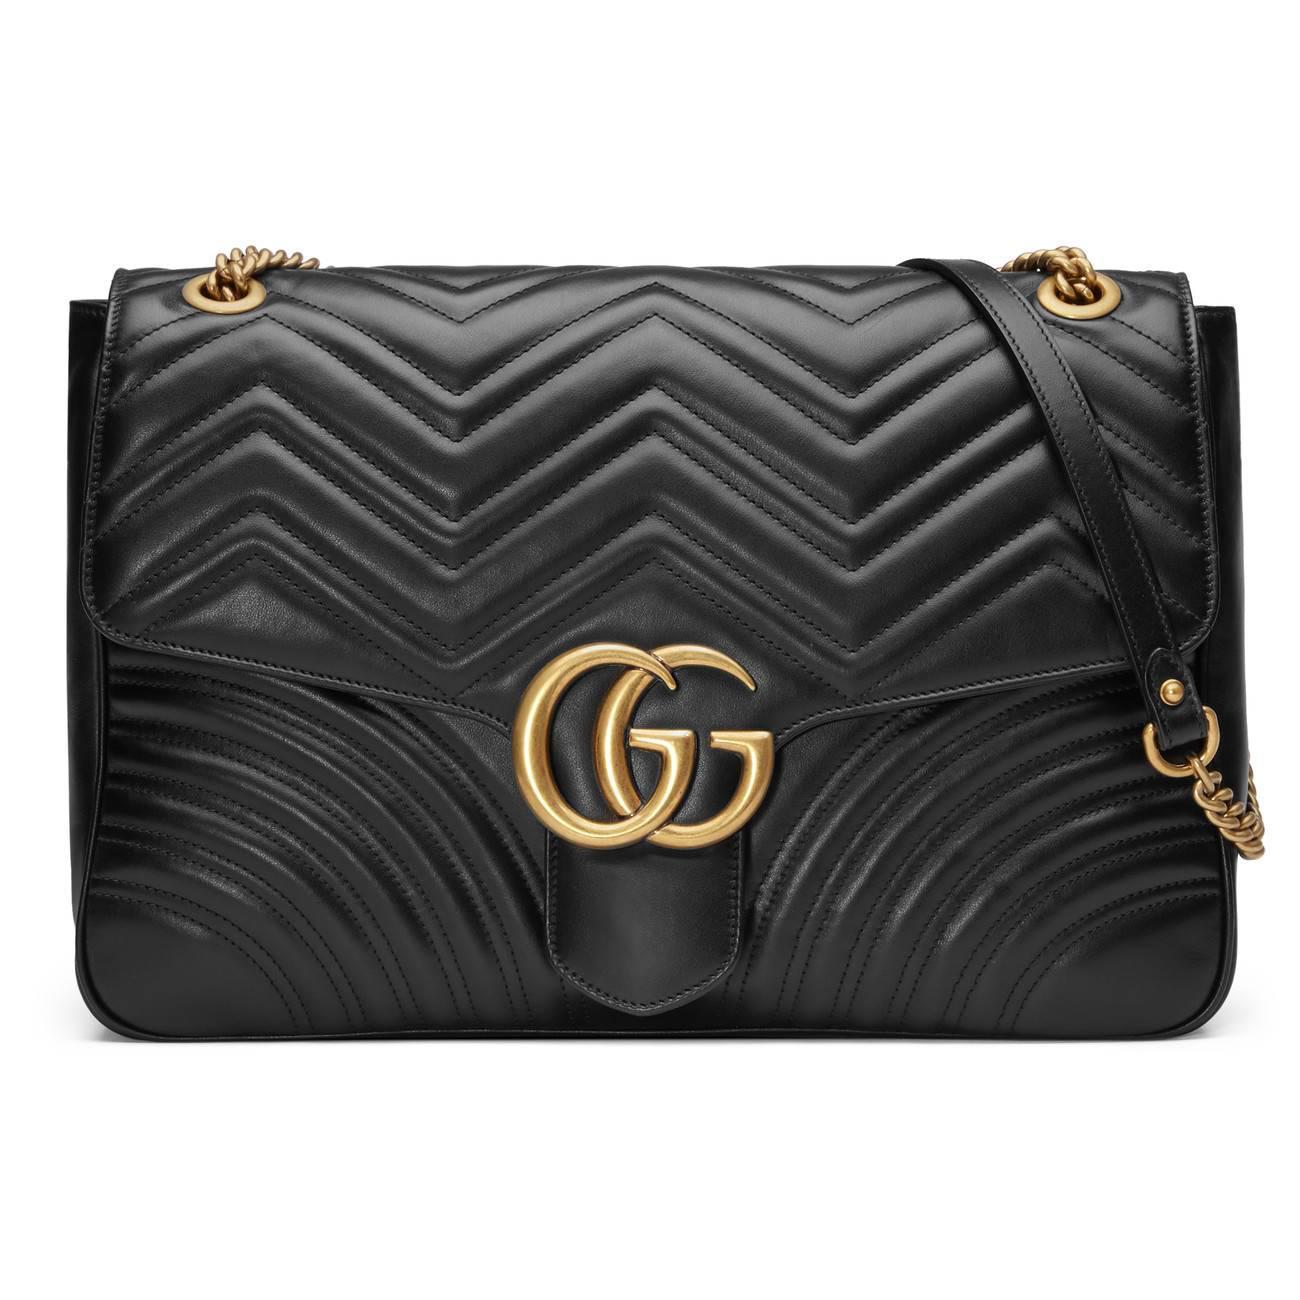 4e7015e37b09 Gucci Gg Marmont Matelassé Shoulder Bag in Black - Lyst